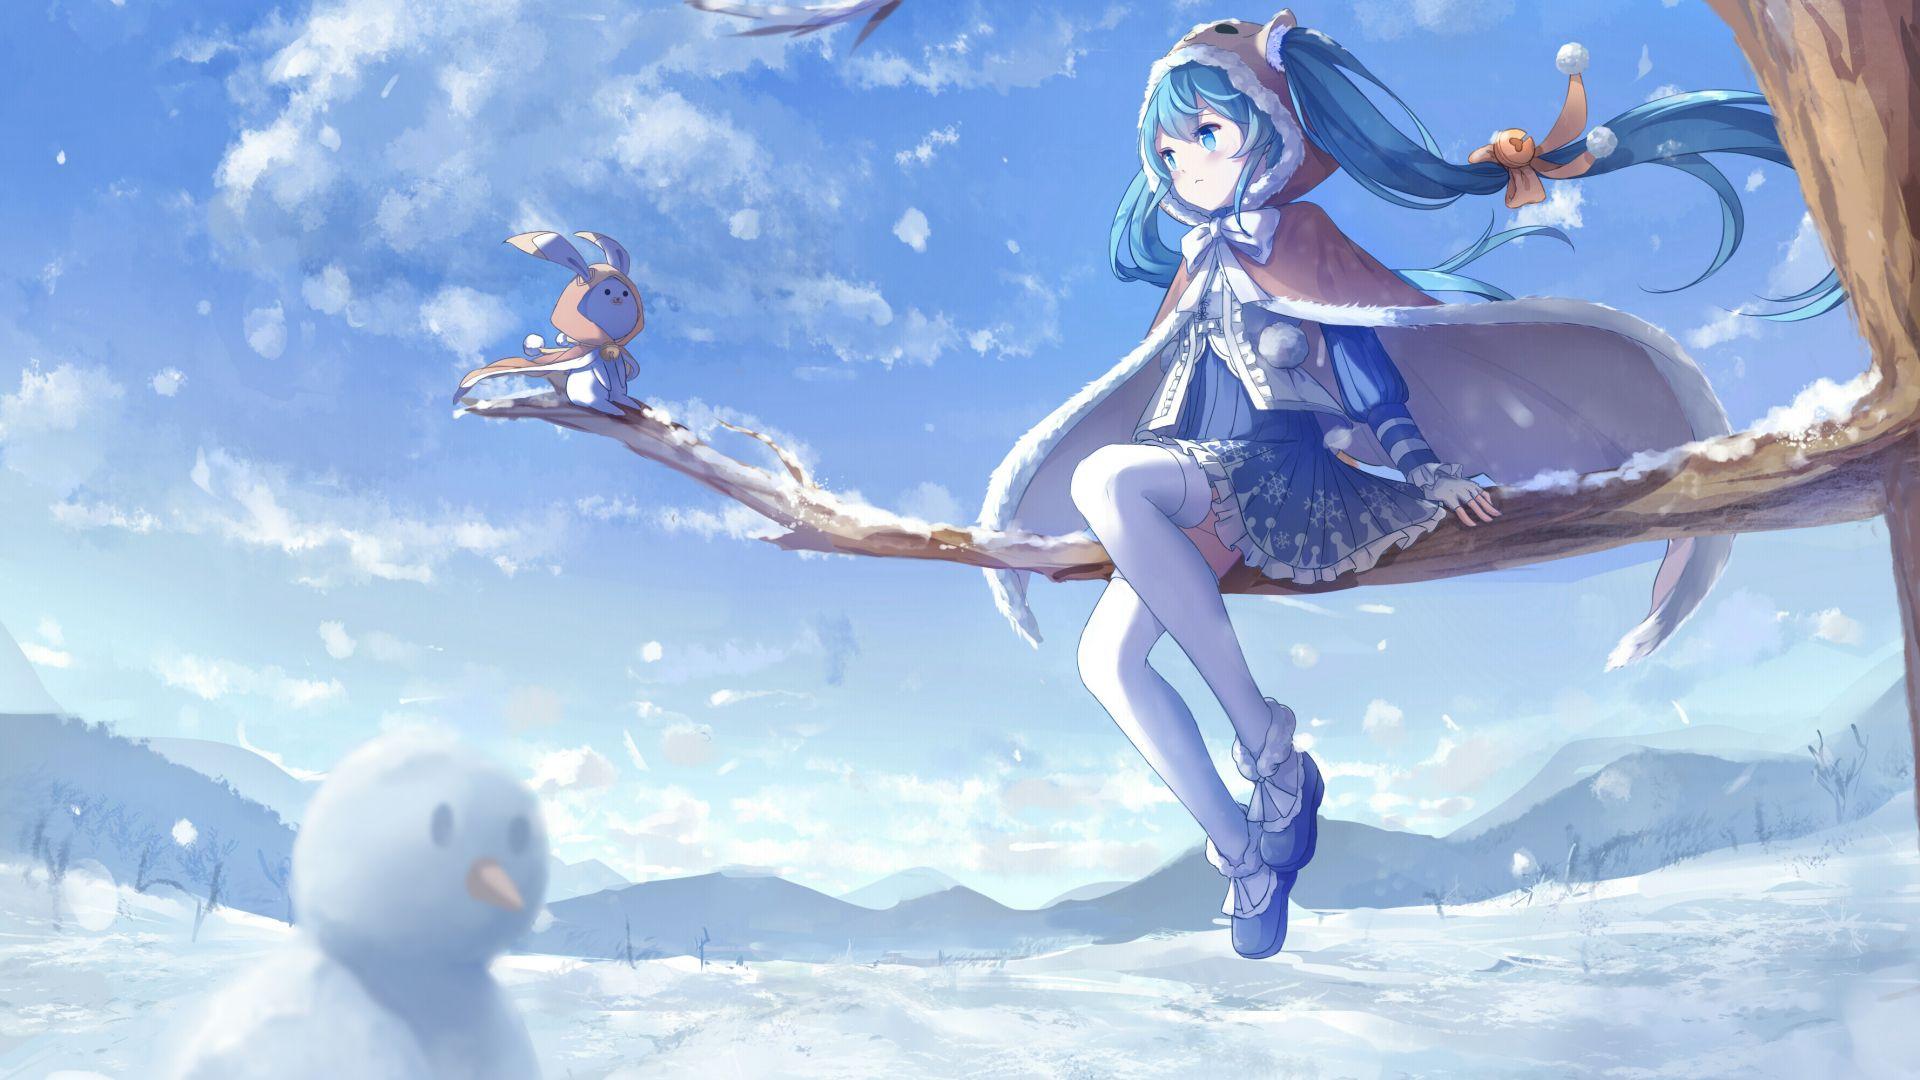 desktop wallpaper hatsune miku  outdoor  winter  hd image  picture  background  37acc1